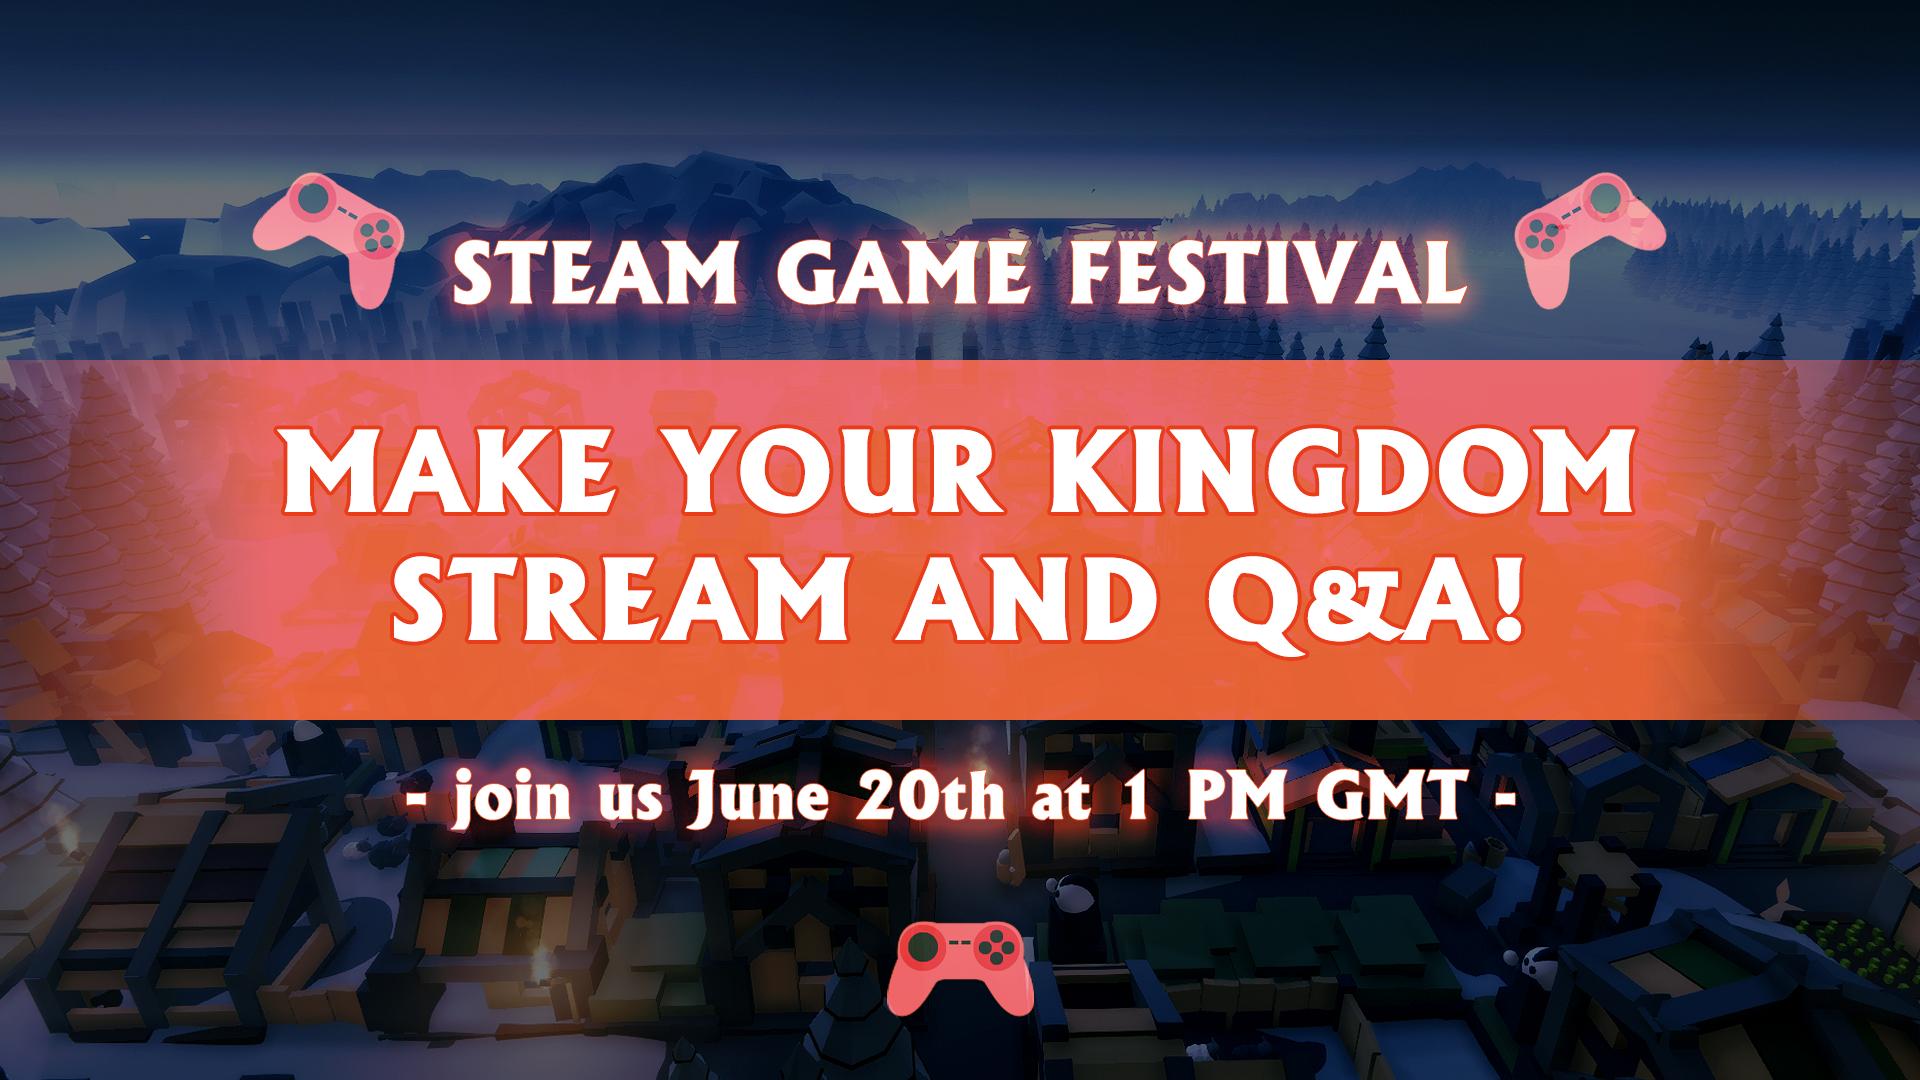 steam games fest en 1